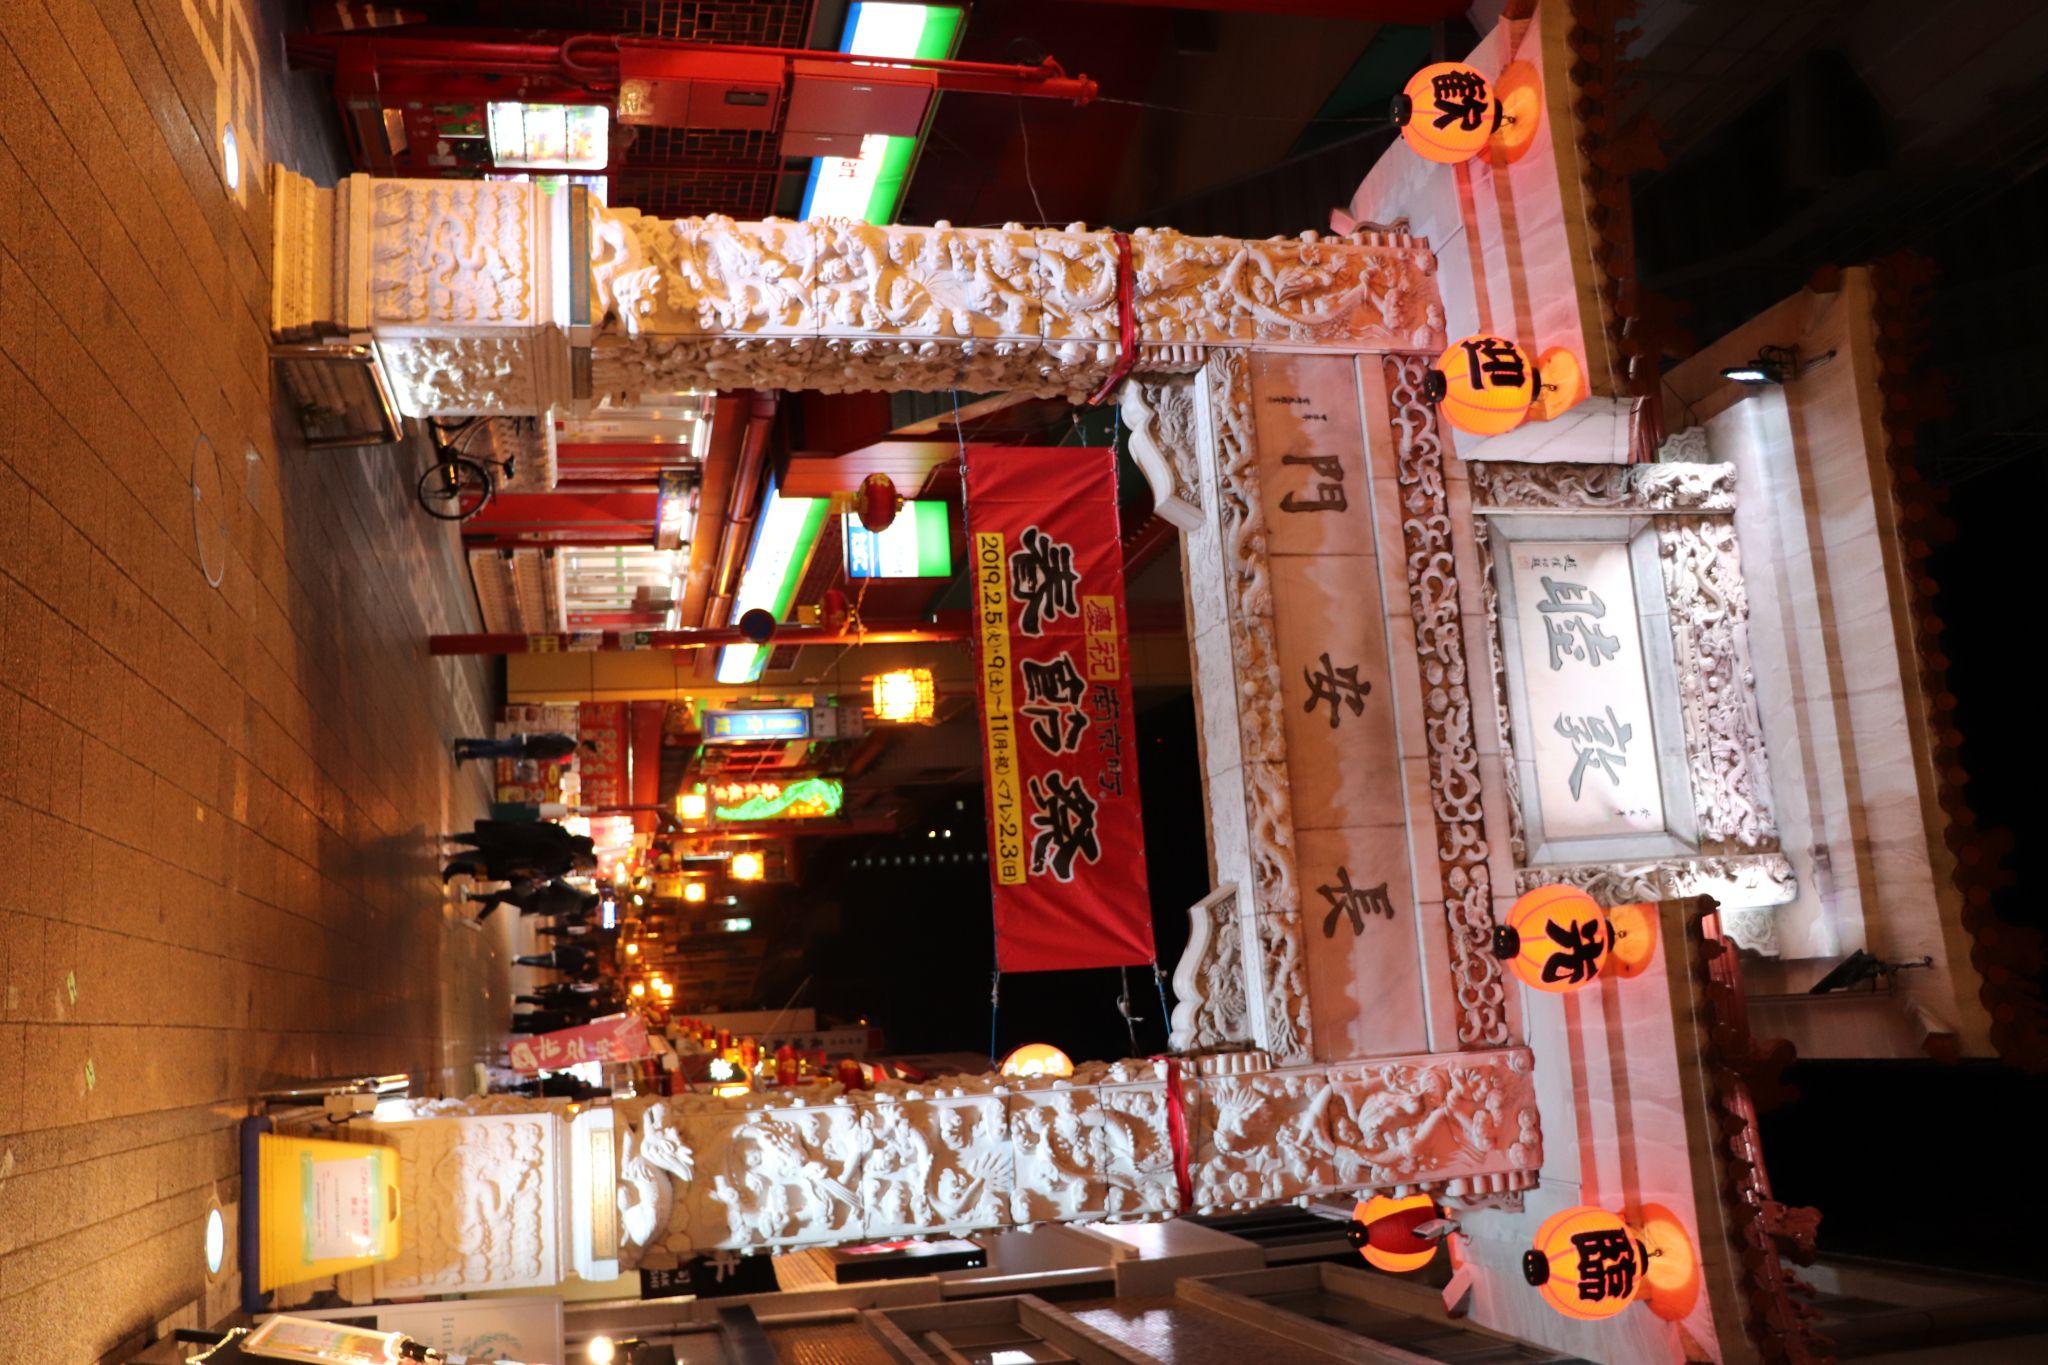 China Town in Kobe, Japan